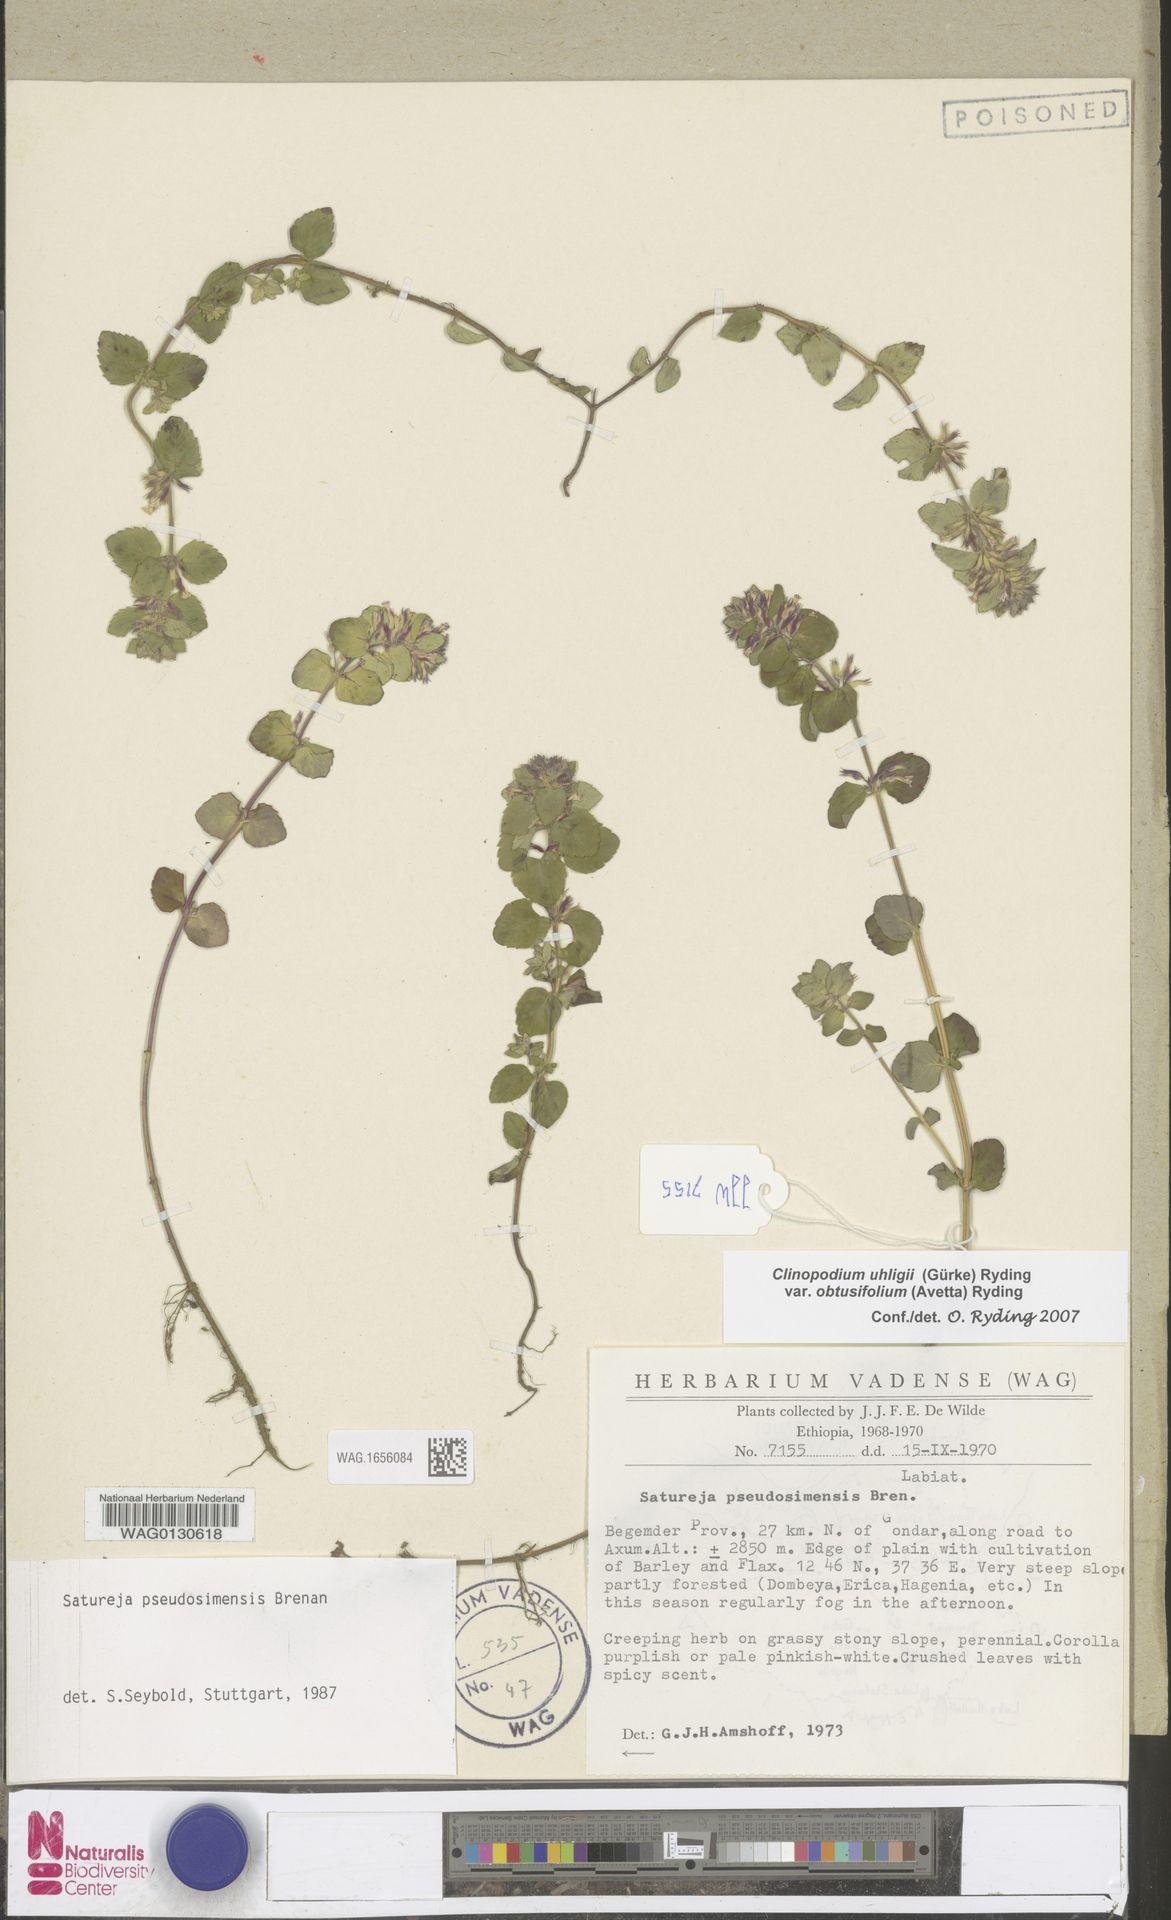 WAG.1656084 | Clinopodium uhligii var. obtusifolium (Avetta) Ryding